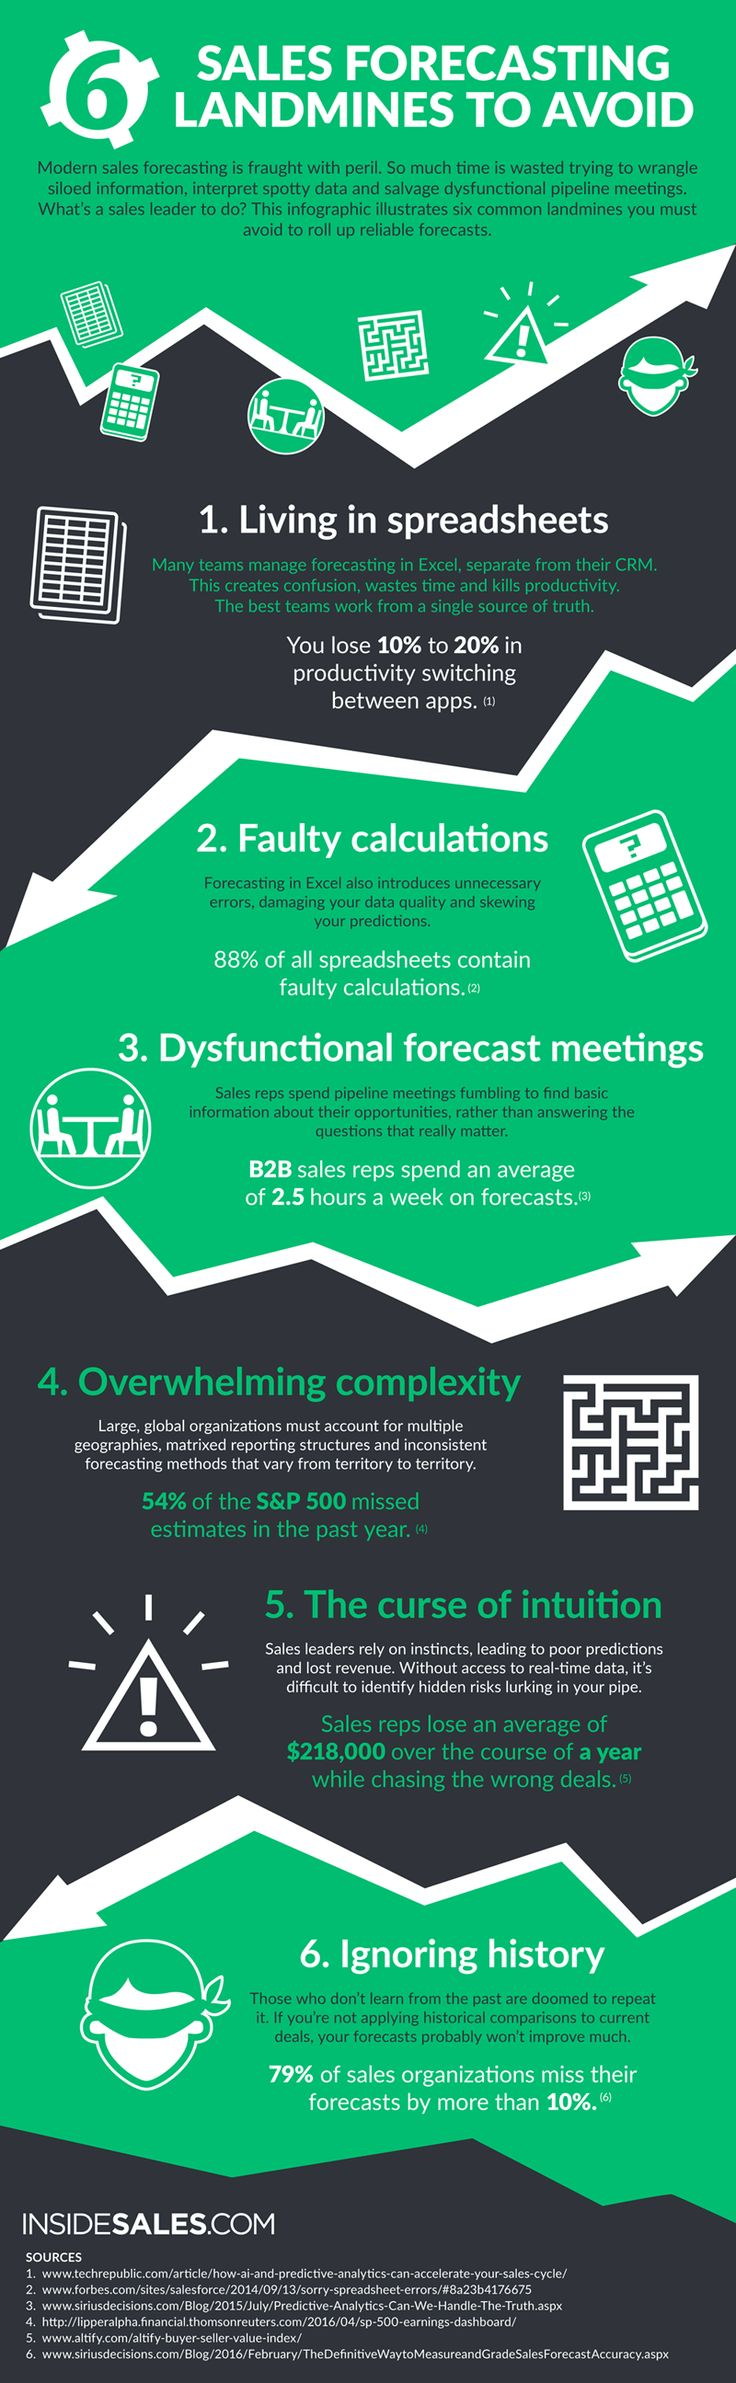 6 Sales Forecasting Landmines Infographic via insidesales